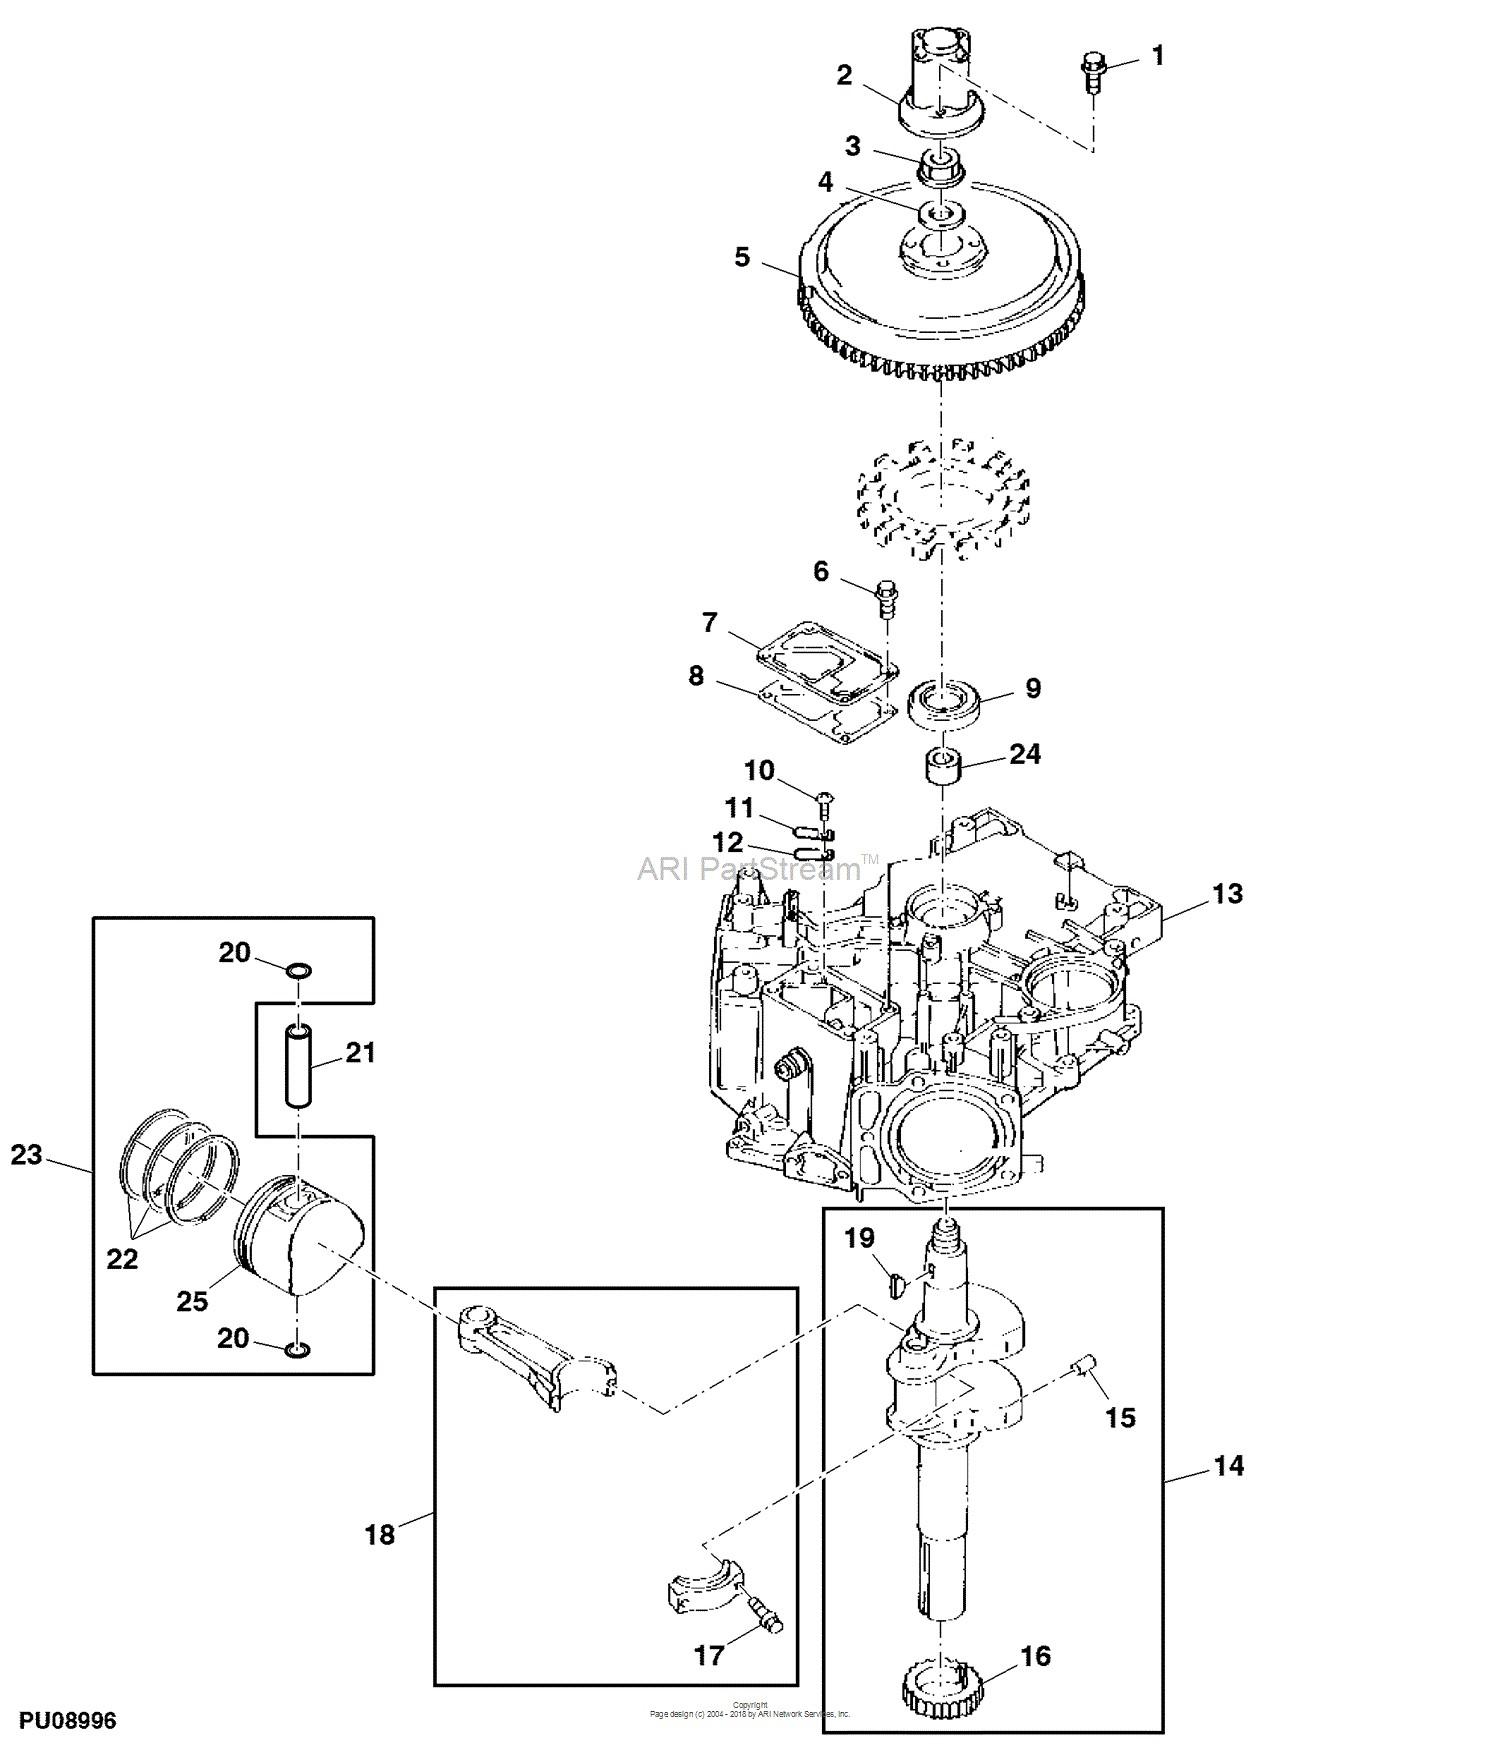 Piston Parts Diagram John Deere Parts Diagrams John Deere F725 Front Mower Pc Of Piston Parts Diagram